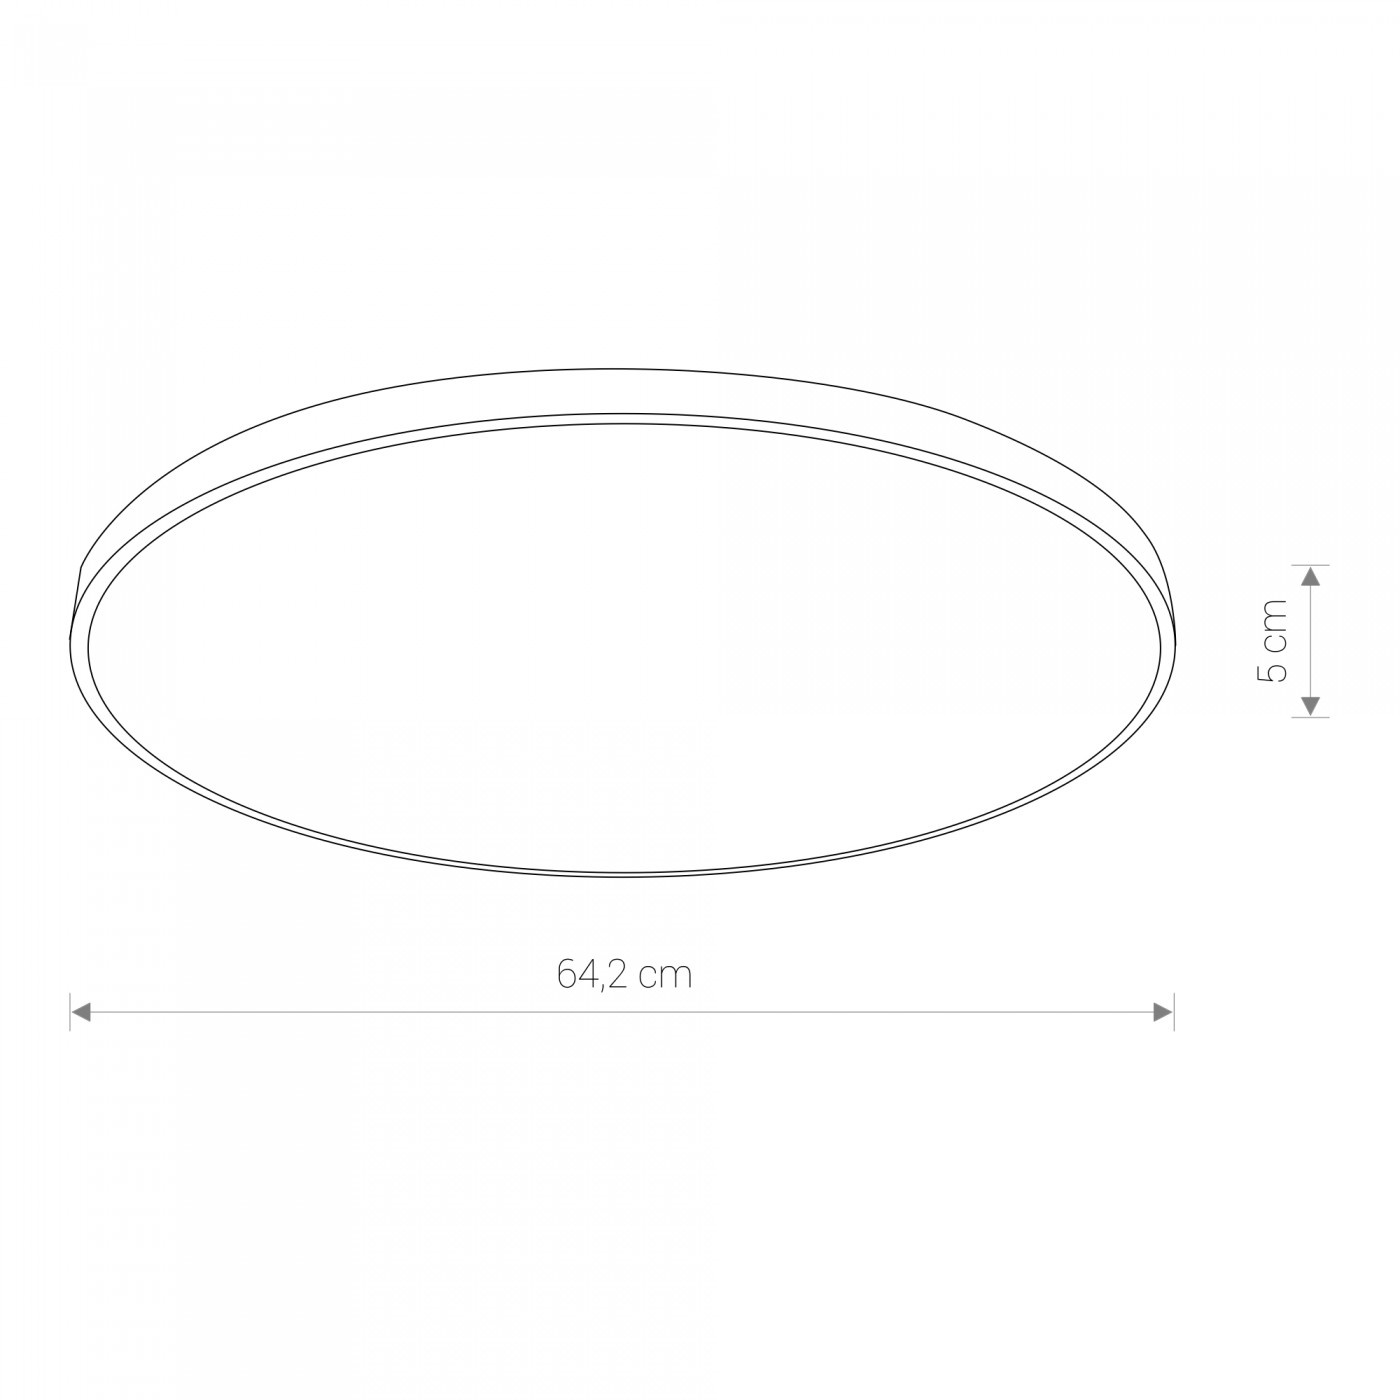 Nowodvorski TL-8188 Agnes Round LED víz-védett mennyezeti lámpa